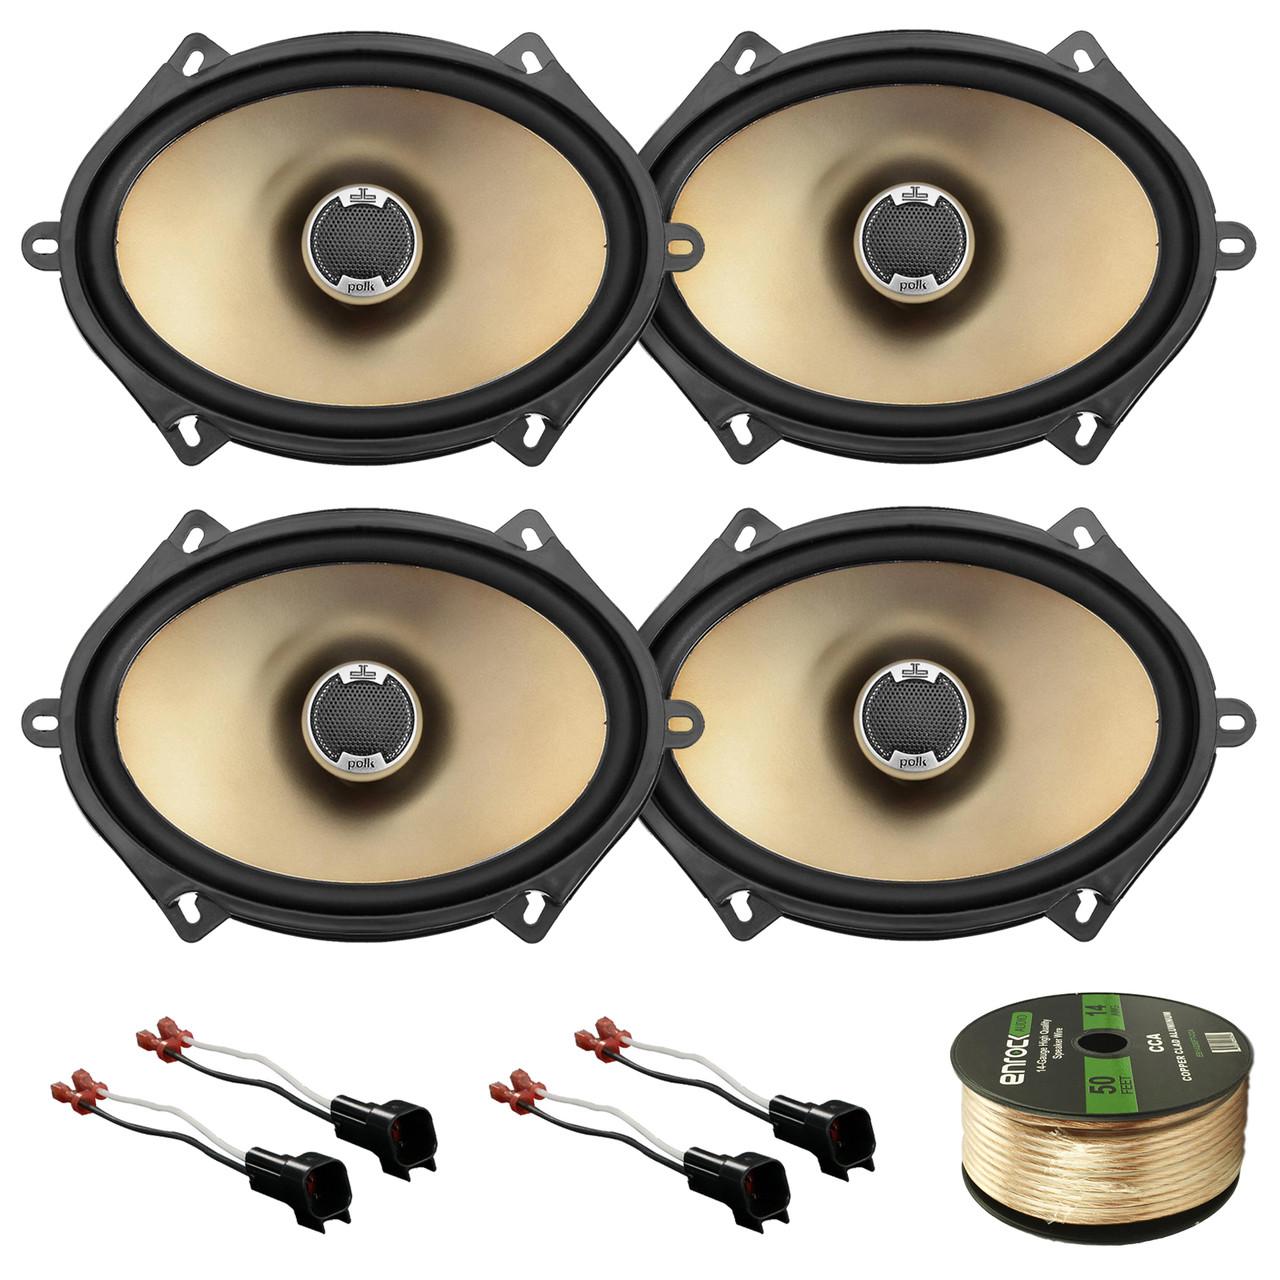 small resolution of enrock 14 awg gauge 50 feet speaker wire 2 x db571 x new pair polk audio car audio 5 x 7 2 way car audio speakers 180 watts max